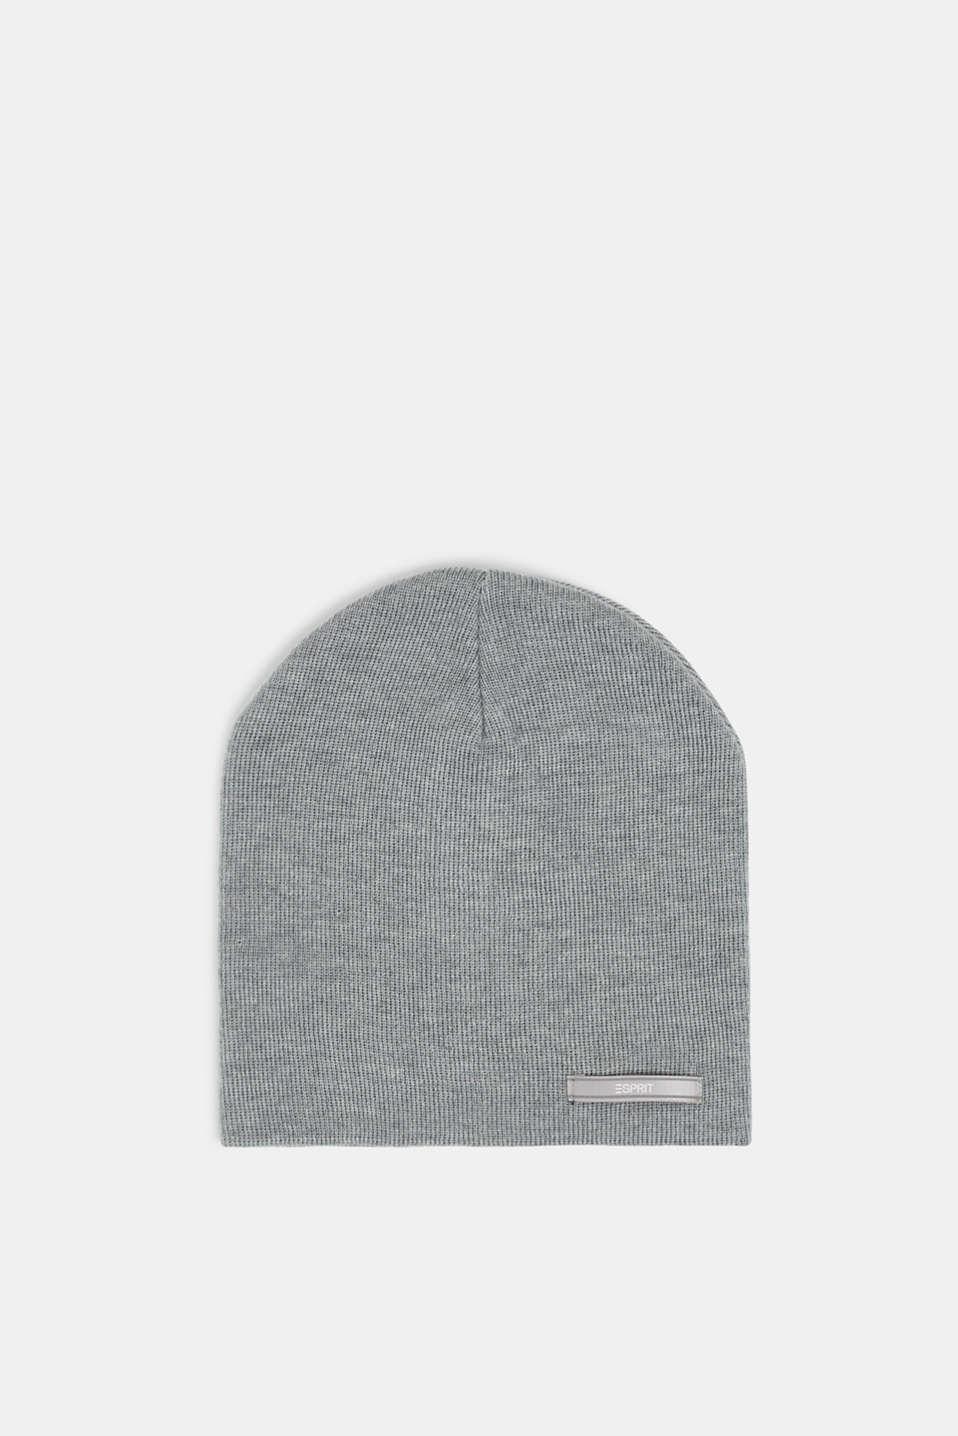 Hats/Caps, GREY, detail image number 0